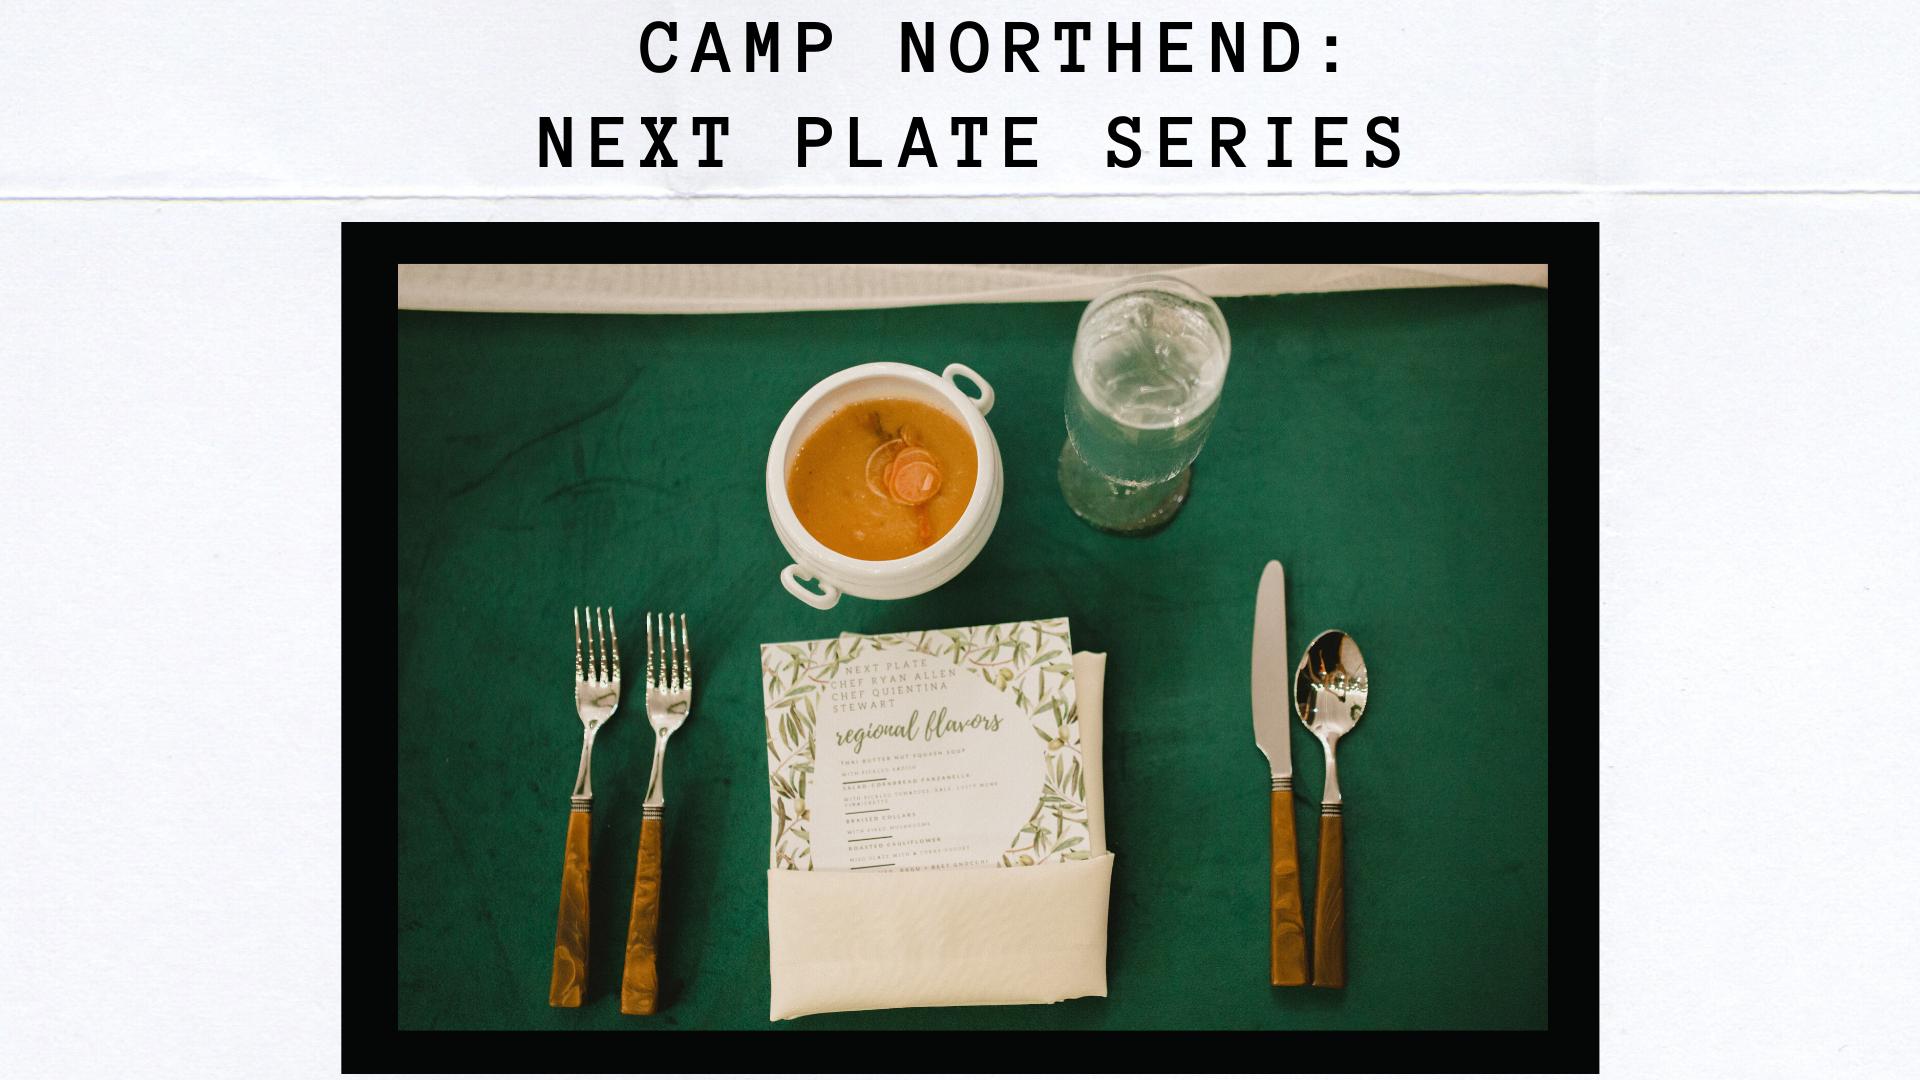 Next Plate: Camp Northend